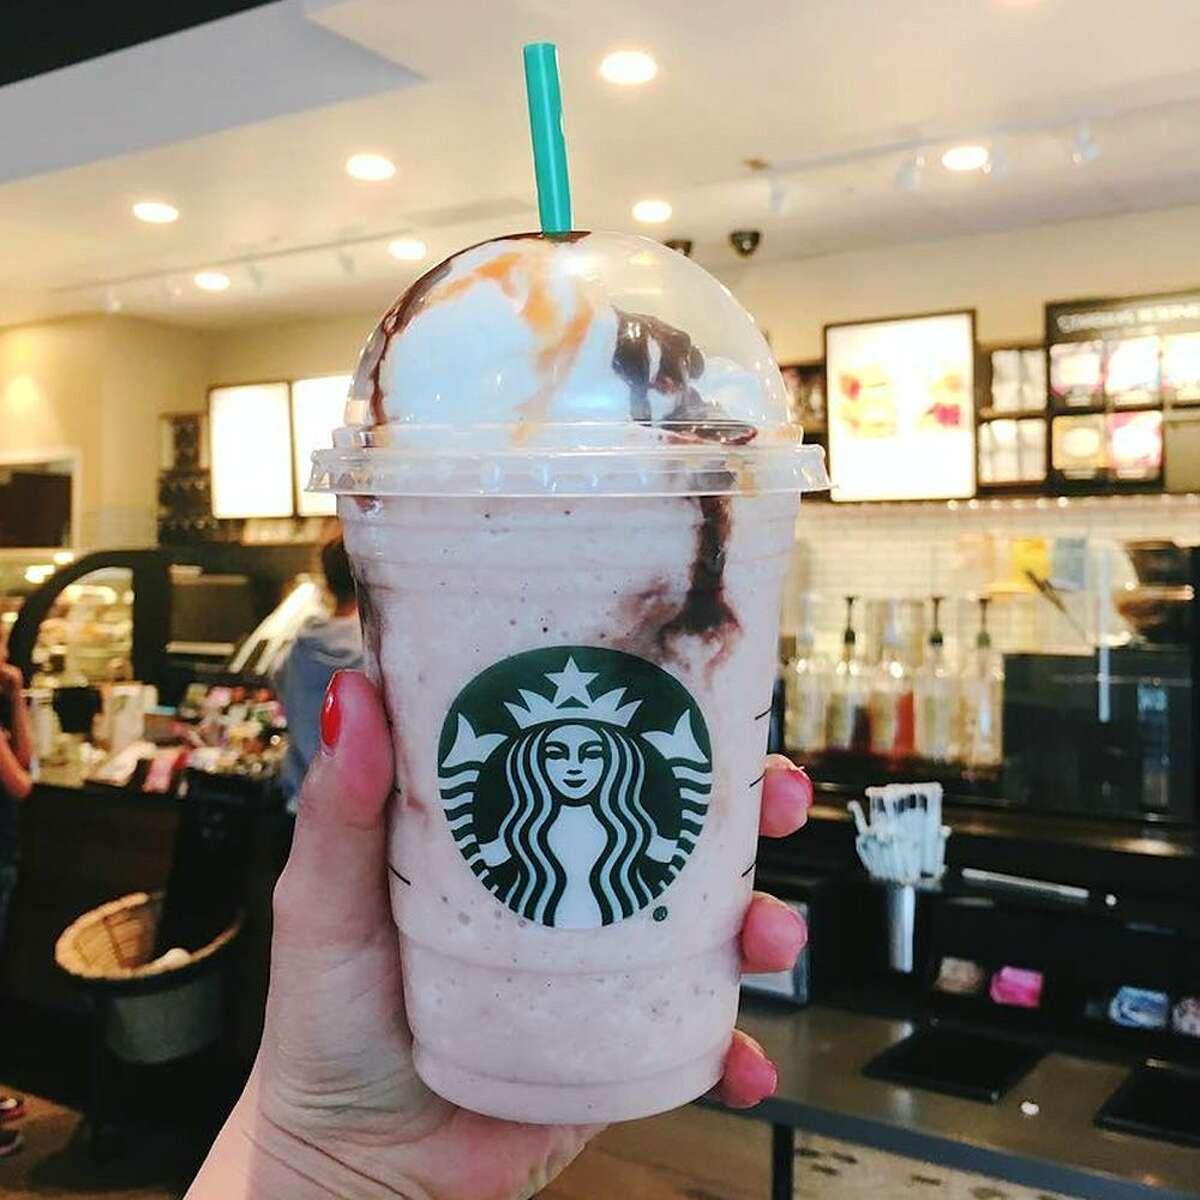 #2 Starbucks2019 U.S. Sales-$21,3802019 U.S. Units-15,049Menu Category: Coffee Cake